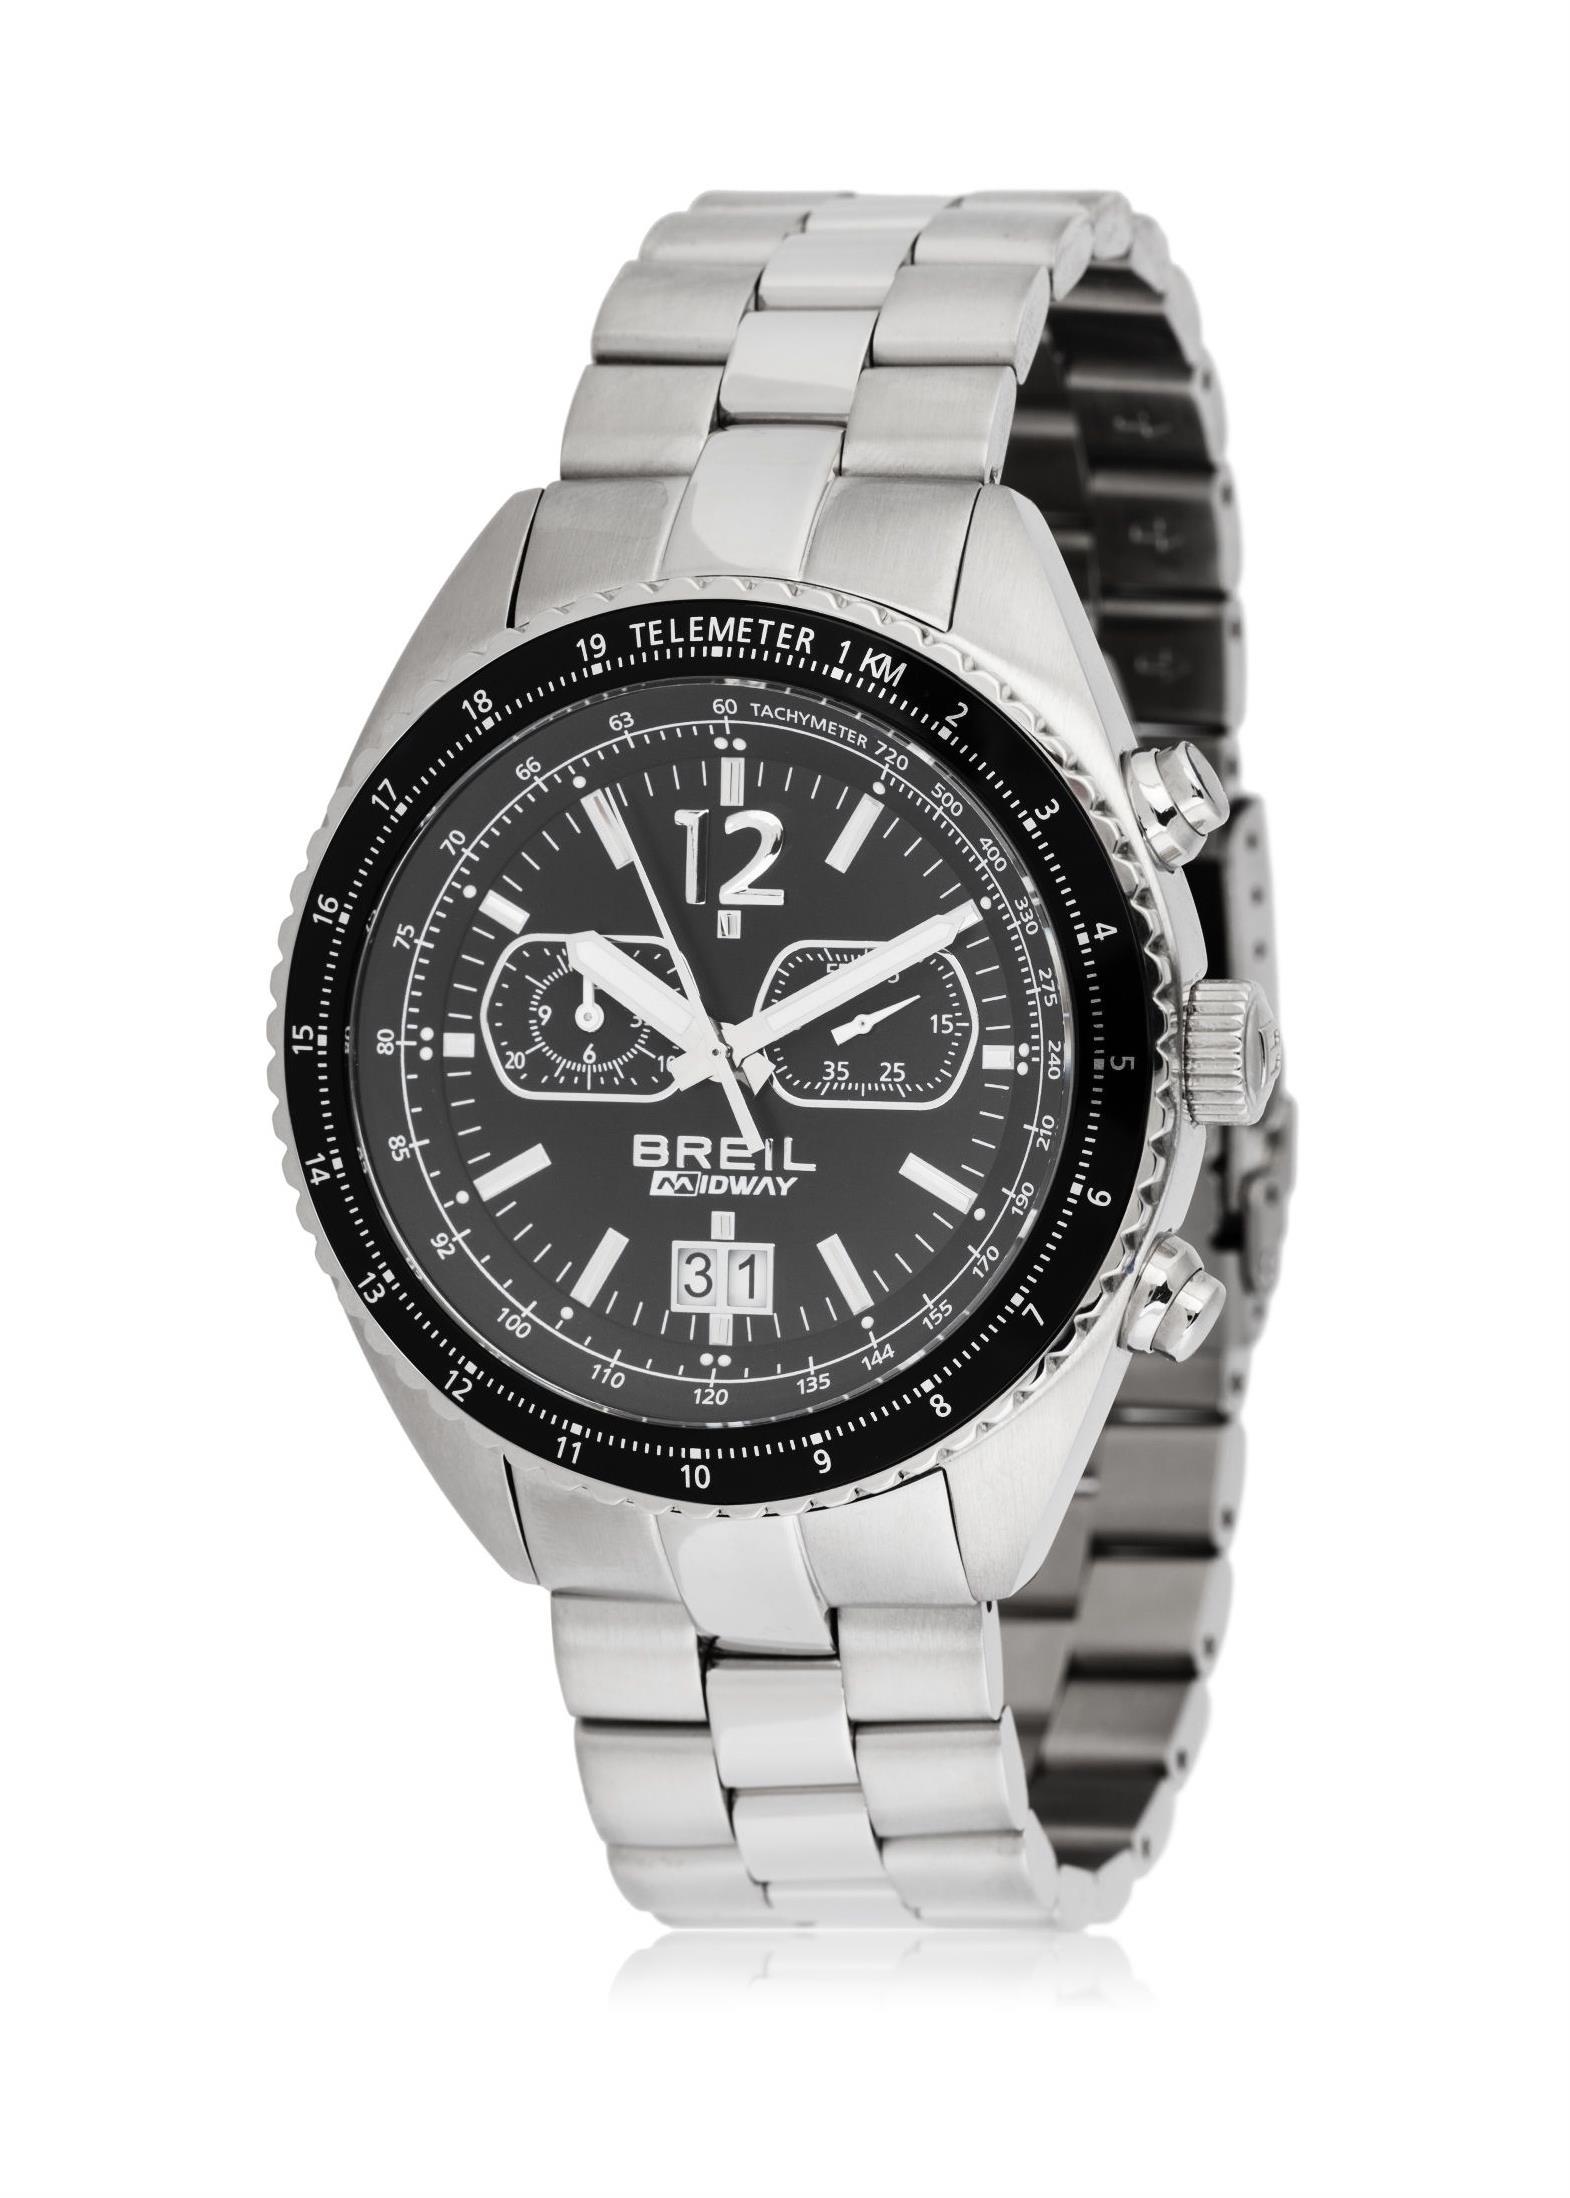 BREIL Mens Wrist Watch Model MIDWAY MPN TW1448